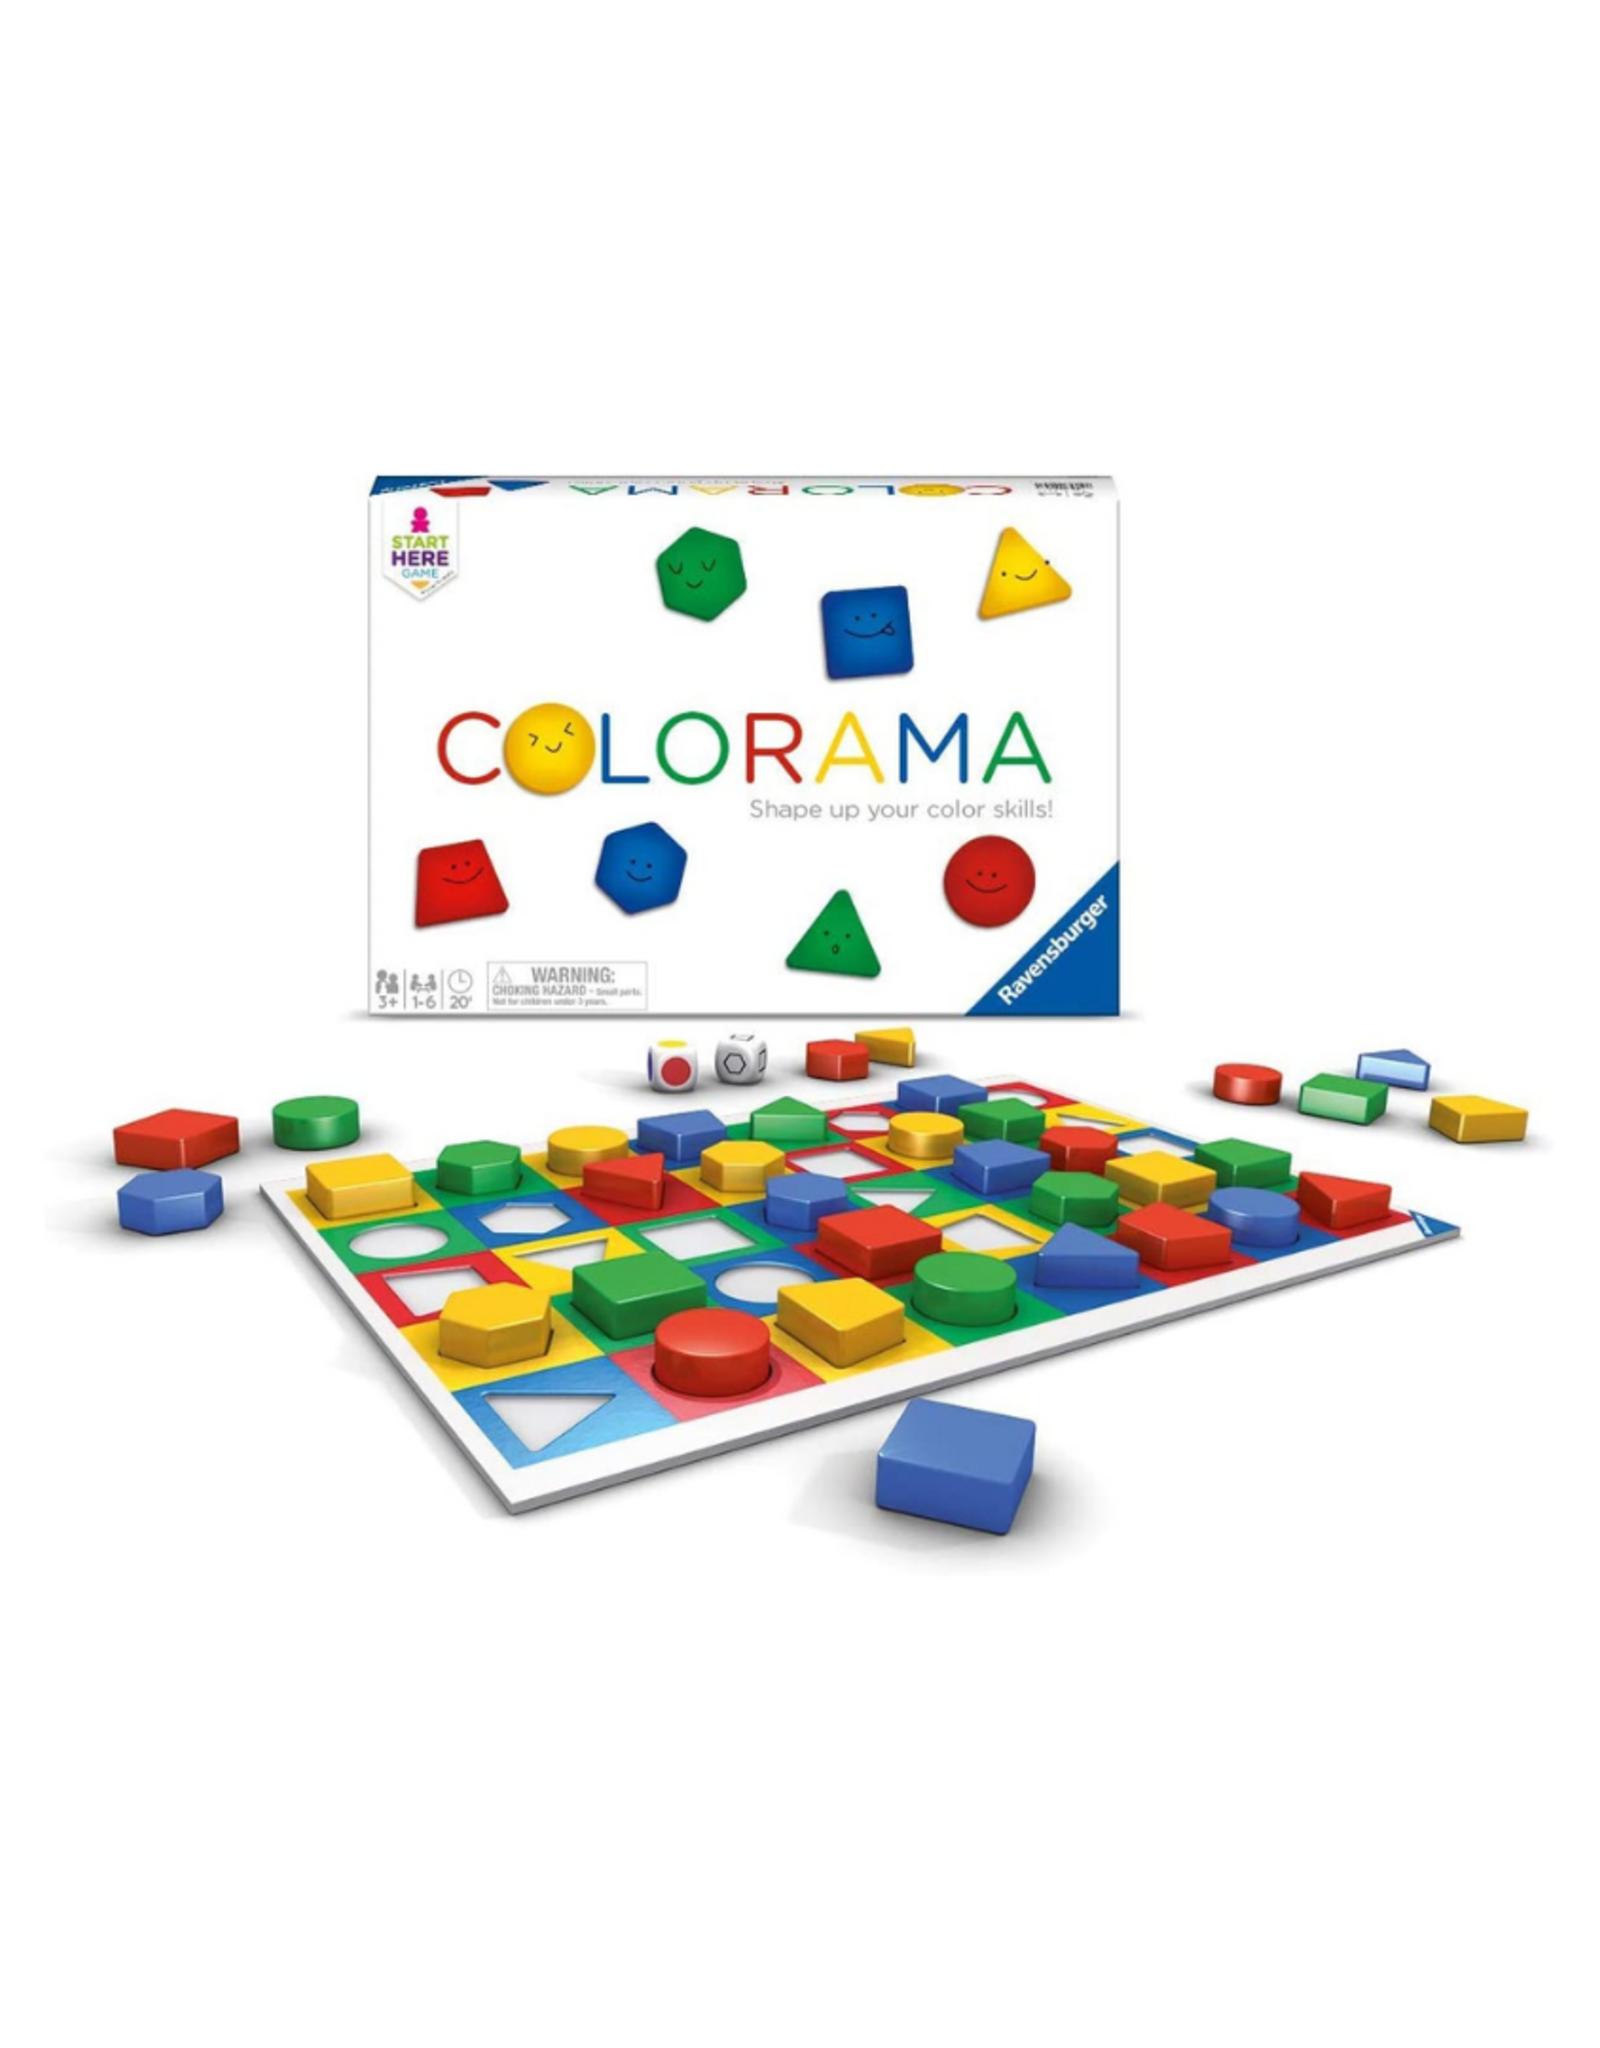 Ravensburger Colorama Game